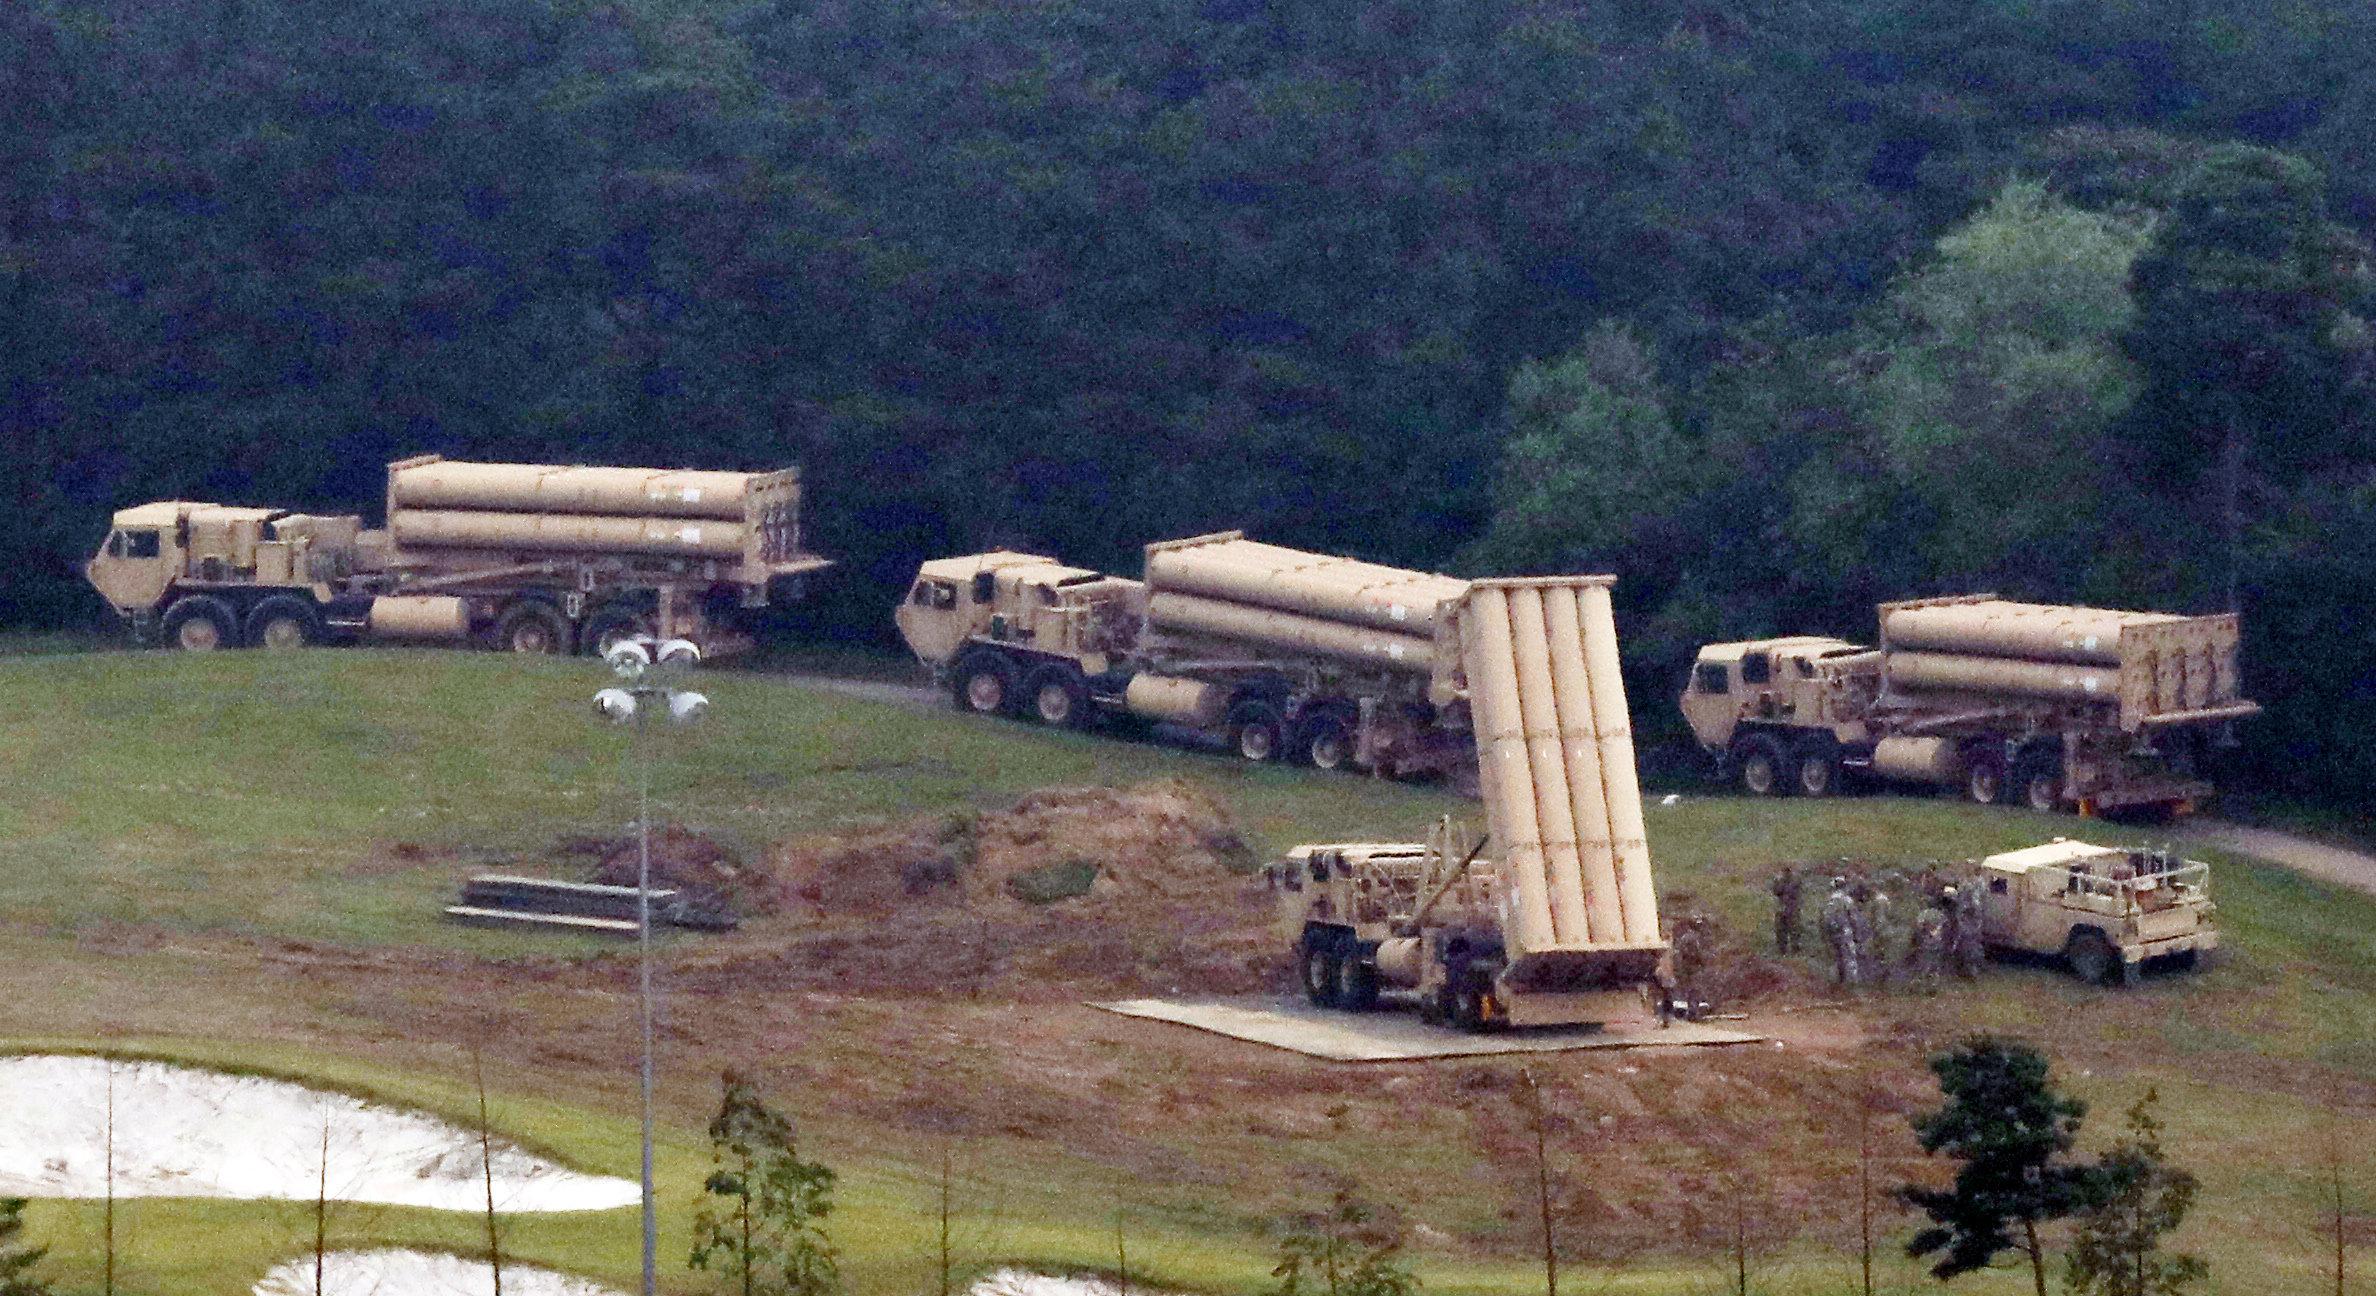 Terminal High Altitude Area Defense (THAAD) interceptors are seen as they arrive at Seongju, South Korea on Sept. 7, 2017. (Lee Jong-hyeon/News1 via REUTERS)